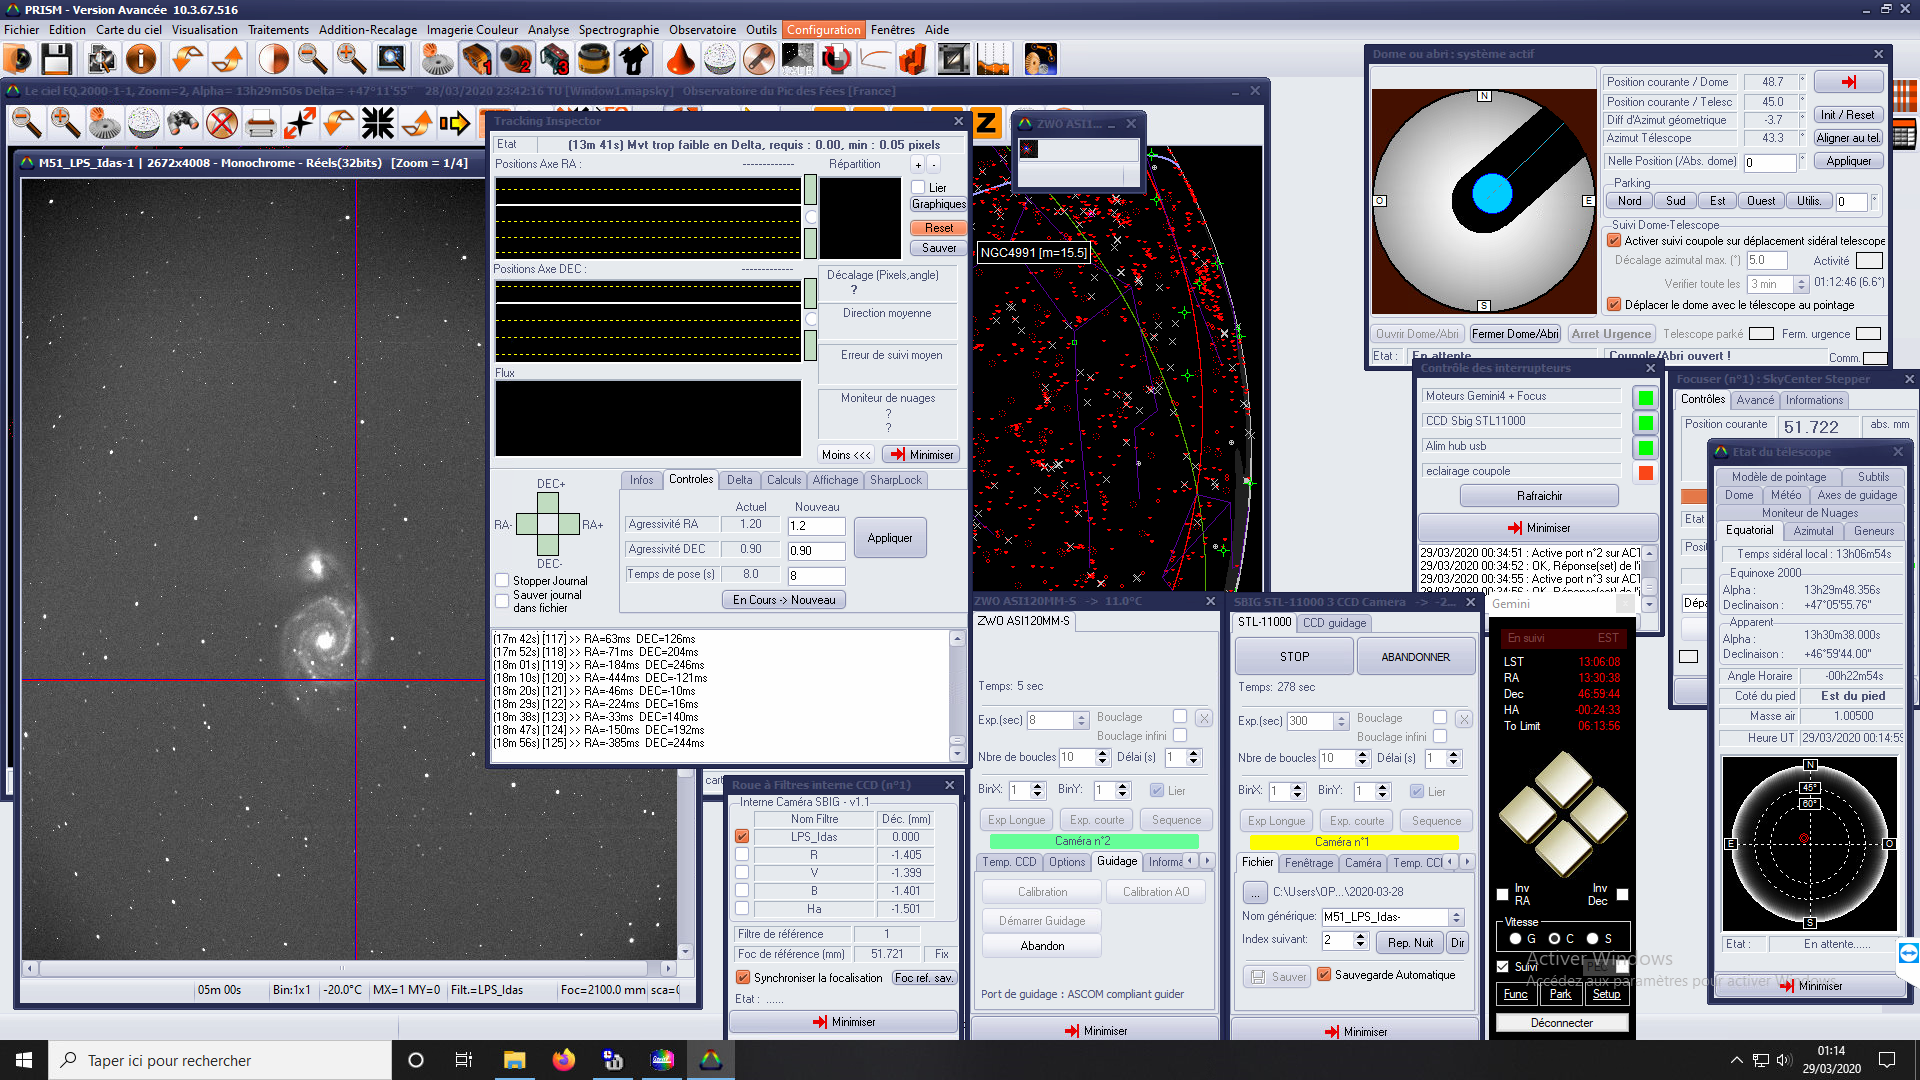 screenshot29032020_01_15.png.a64093bbfb29eedfaea11086f13b703a.png